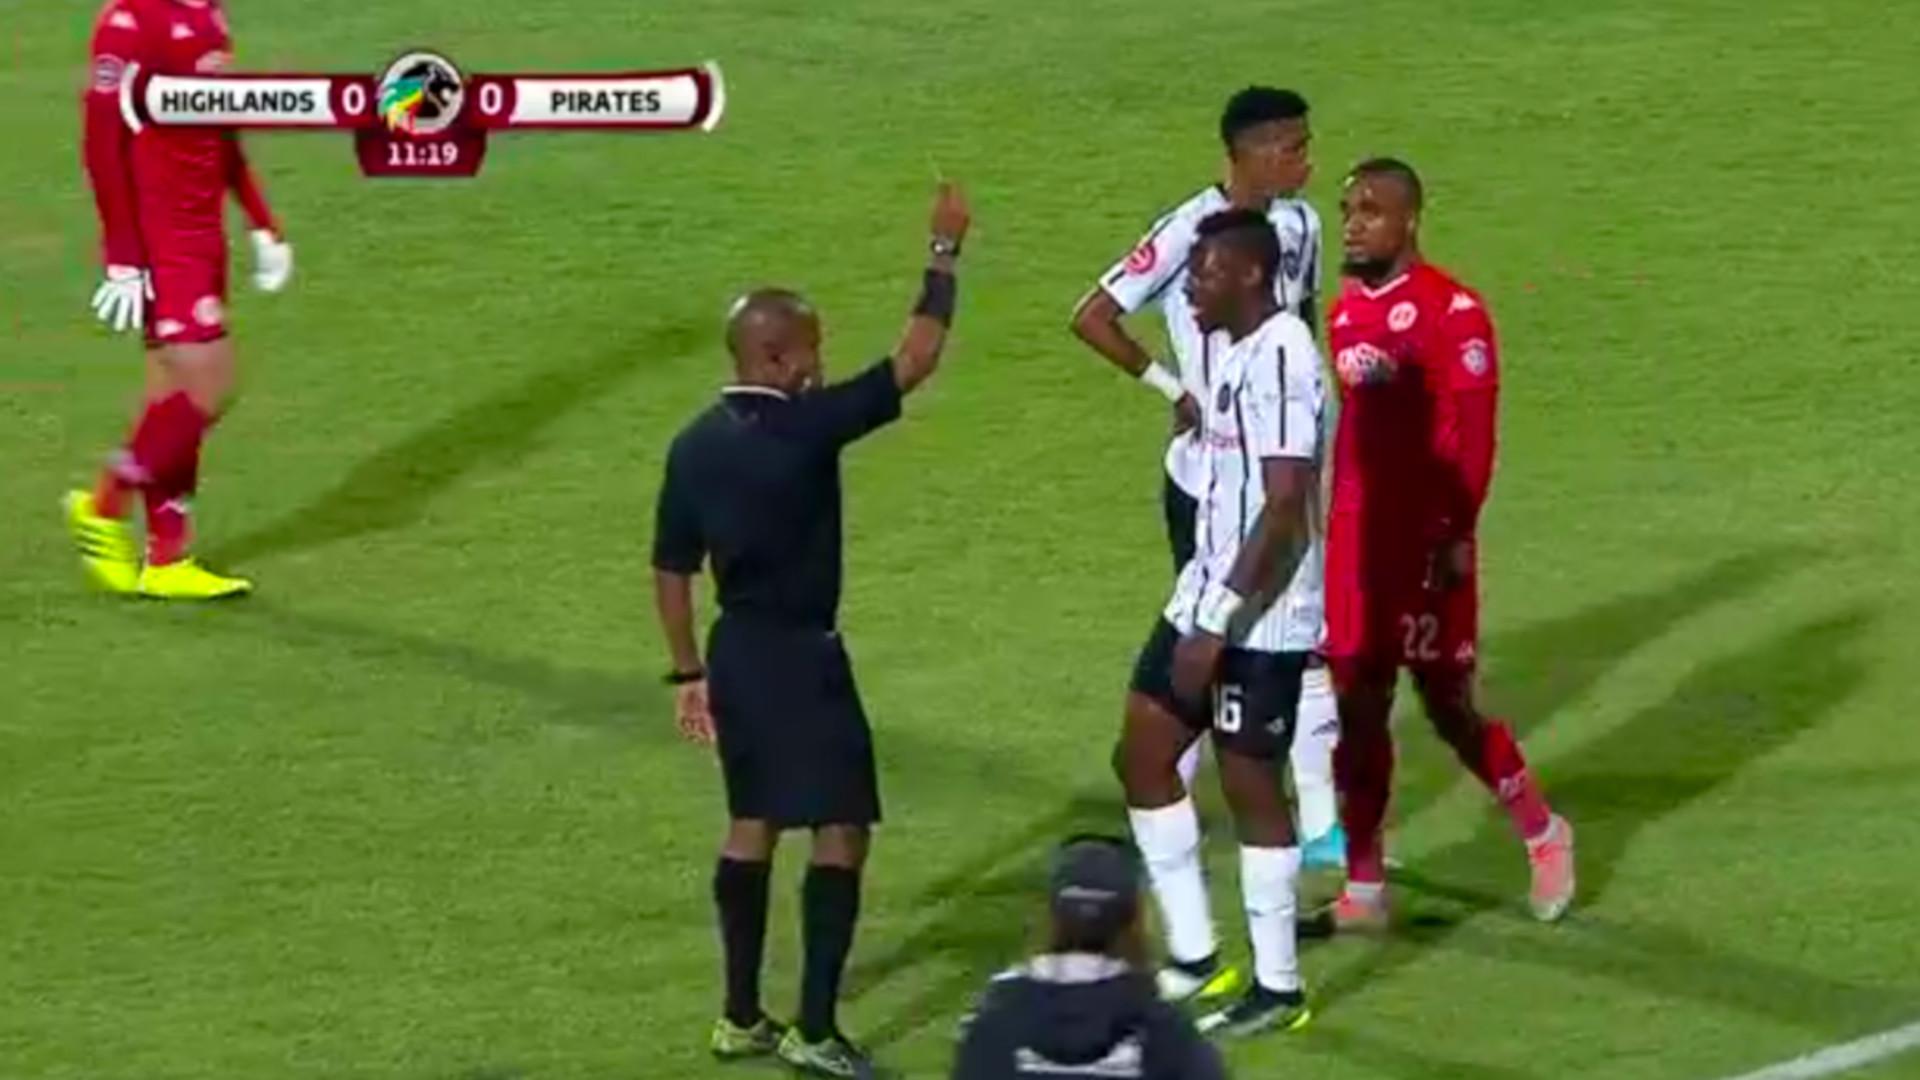 Absa Premiership 2019/20 | Tshegofatso Mabaso Yellow Card